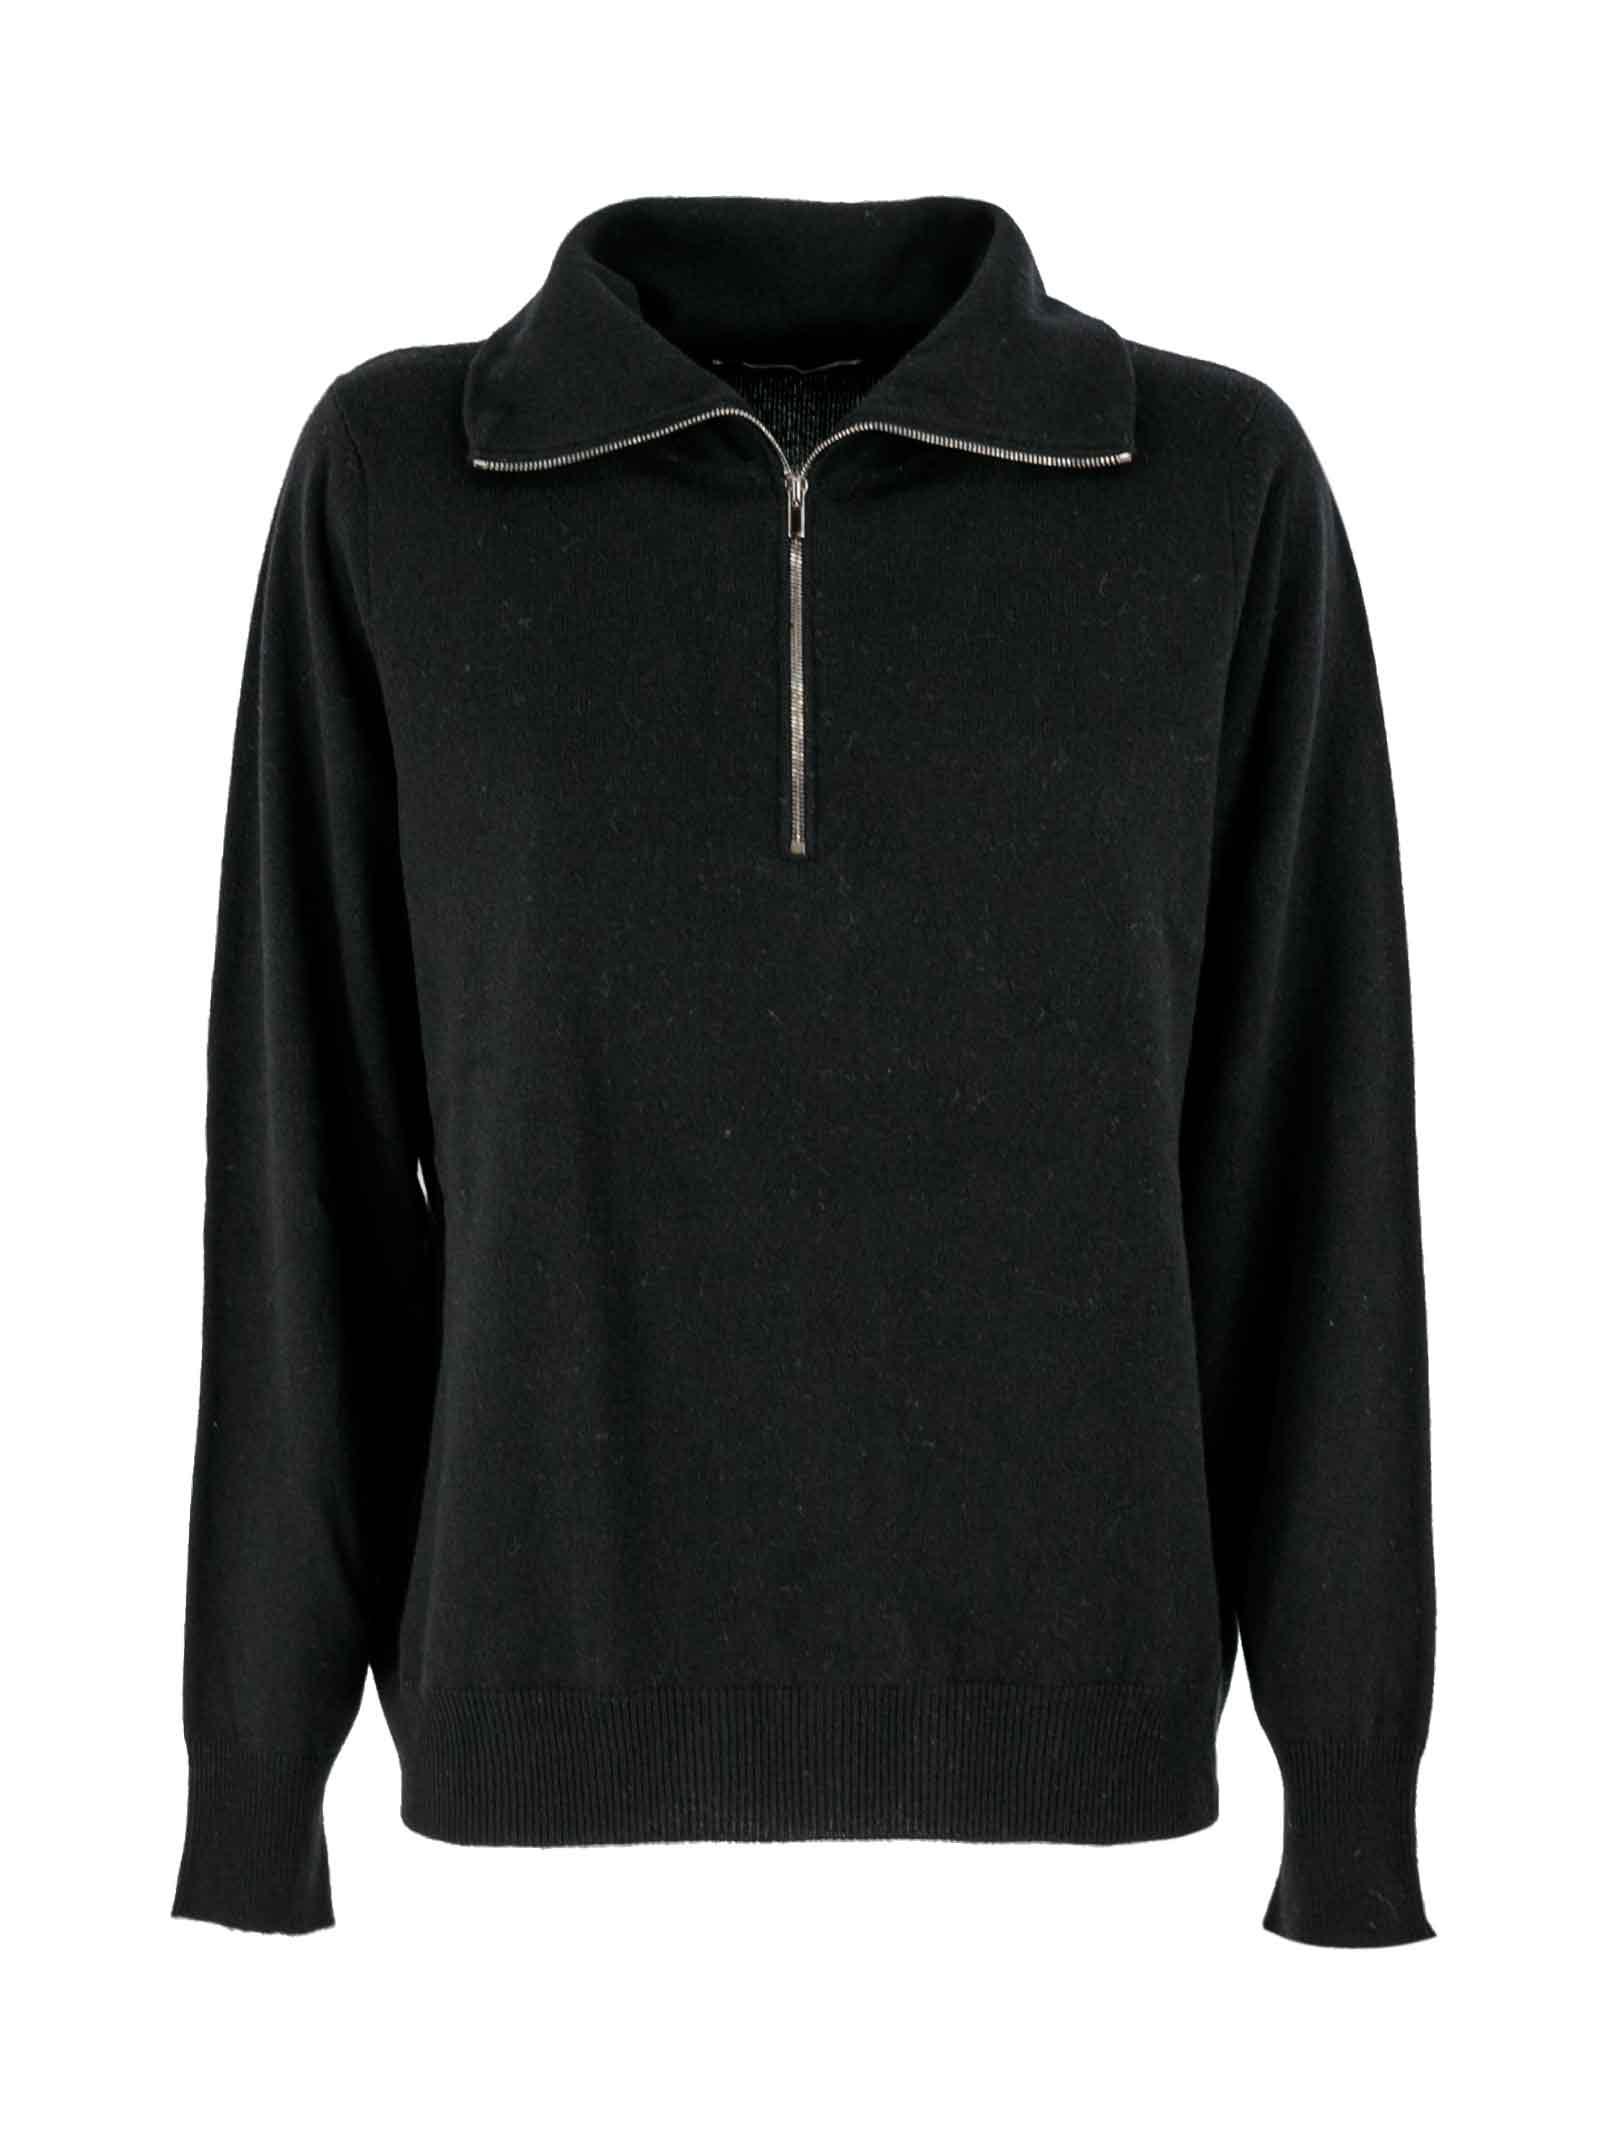 Hinged Neck Detailing Sweater